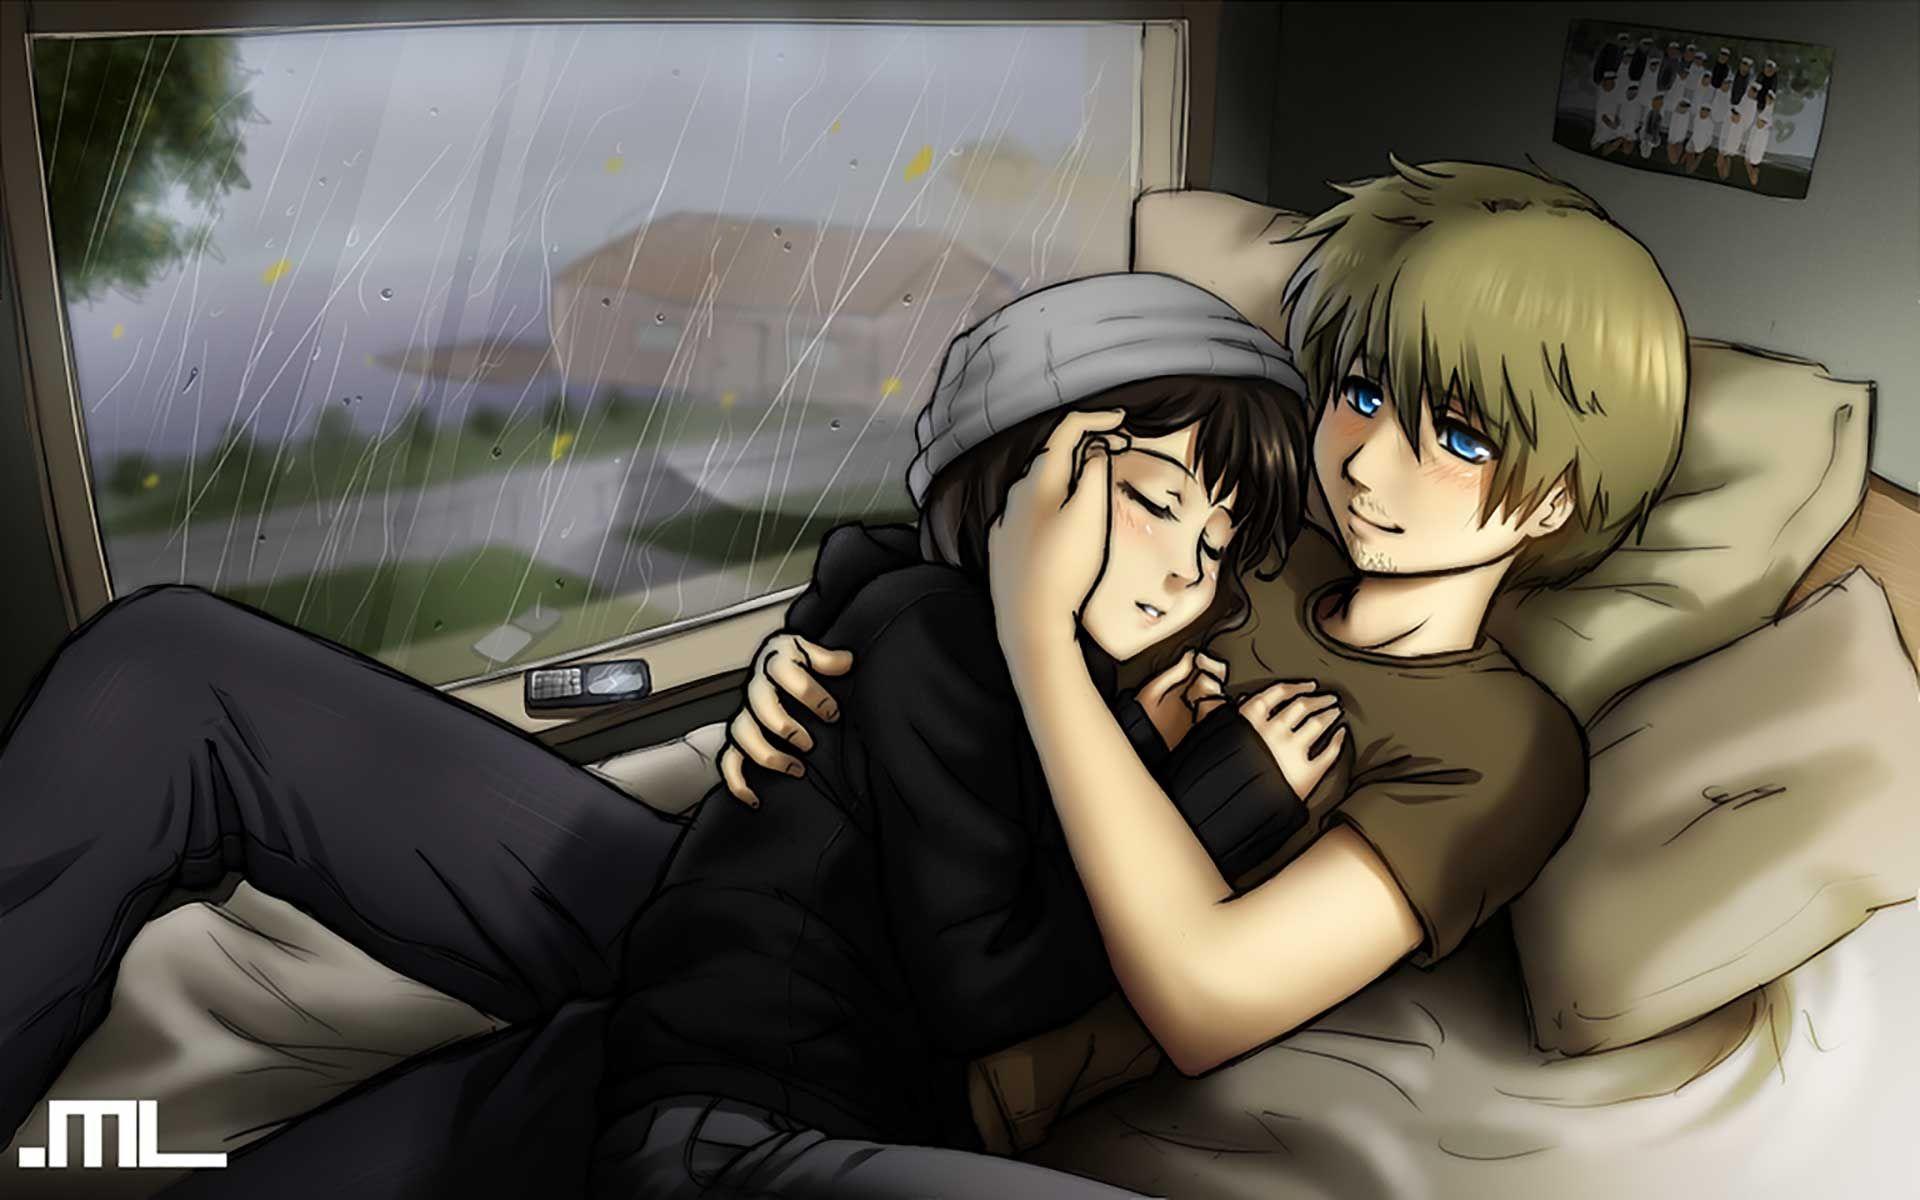 Cartoon boy alone pic sadever romantic couples anime wallpapers romantic wallpapers chobirdokan anime couples cuddling cute anime couples